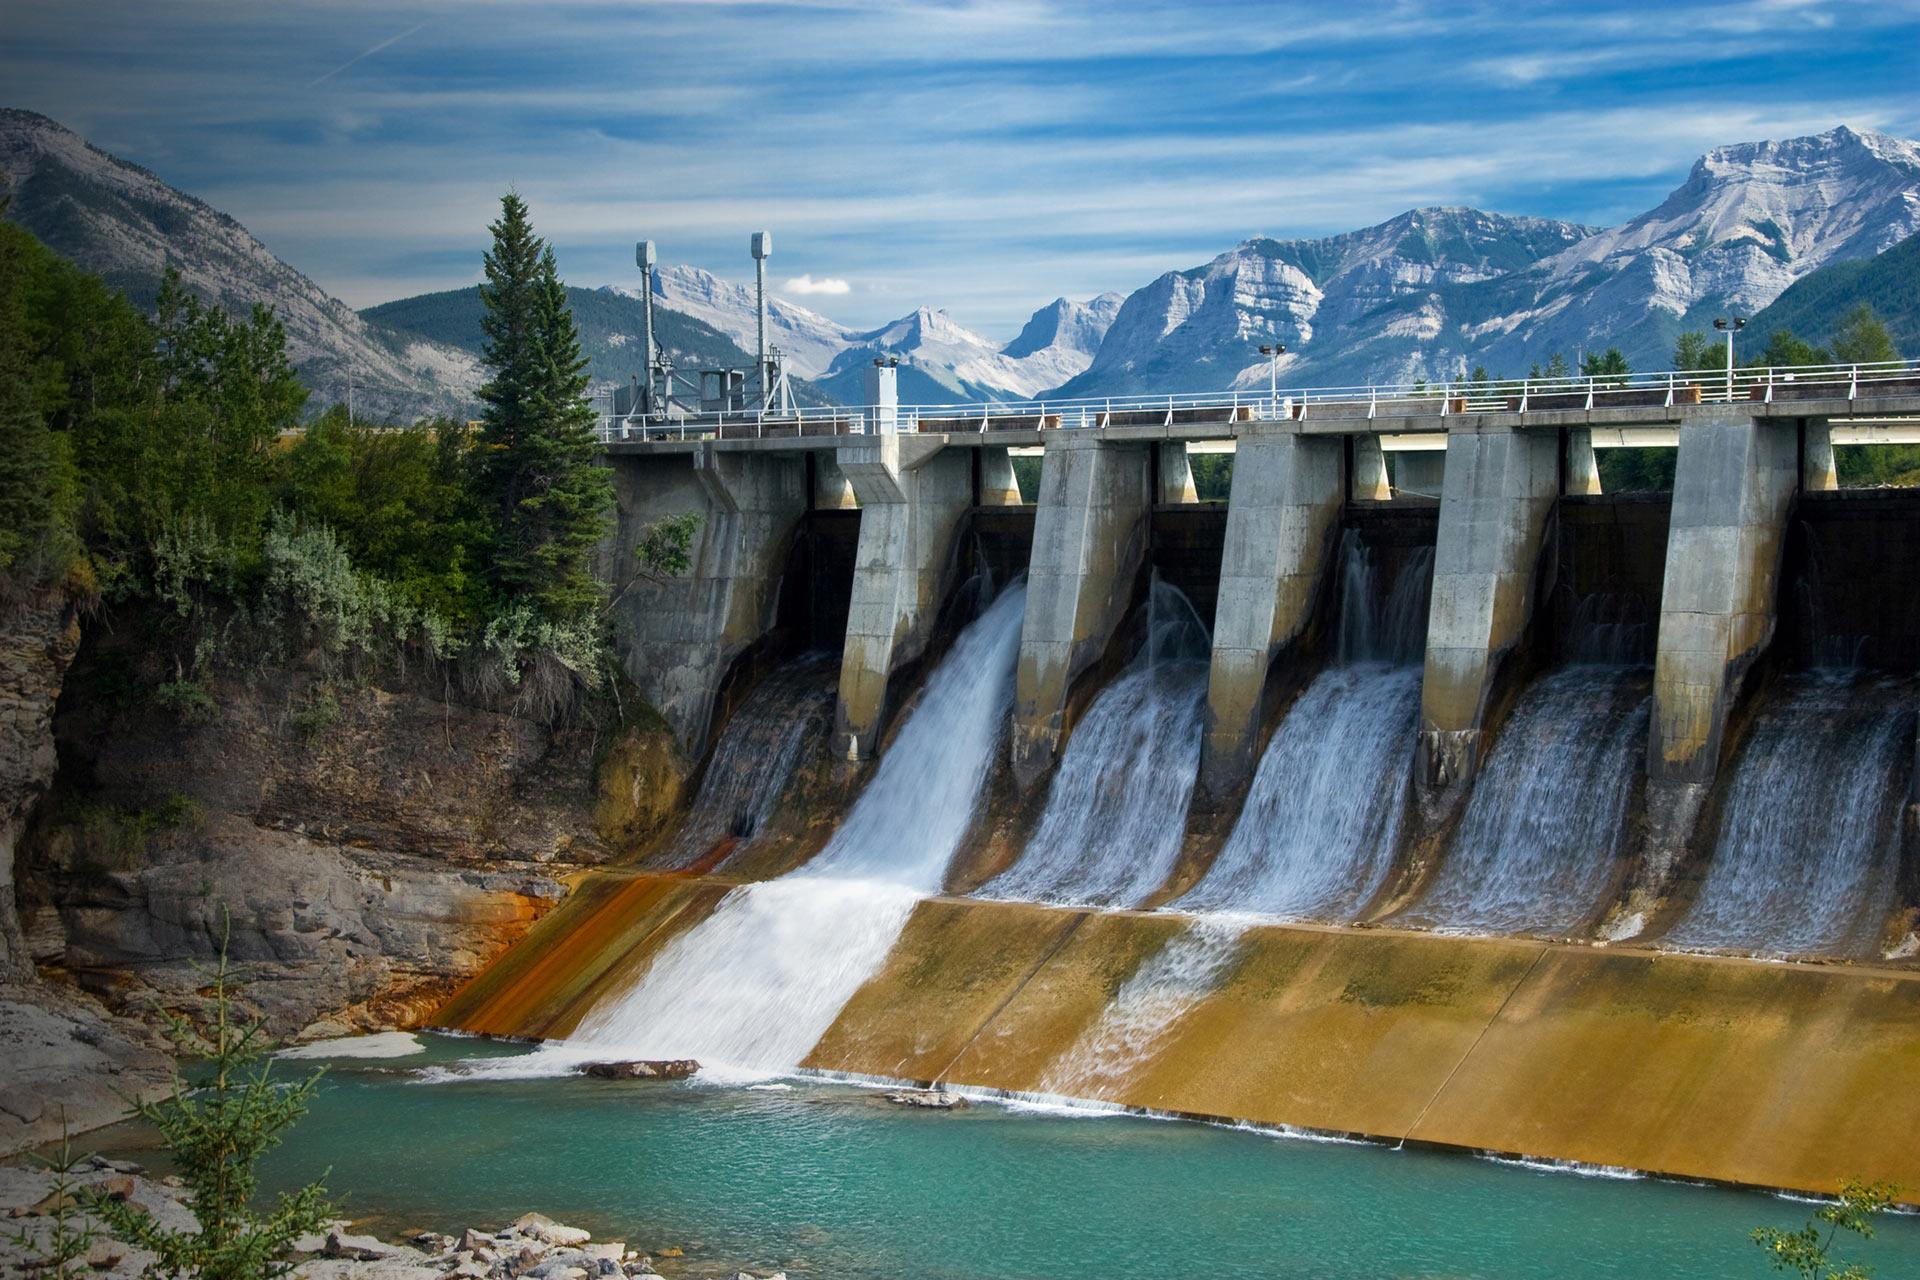 https://cwf-fcf.org/assets/images/dam-river-mountains-177332436.jpg